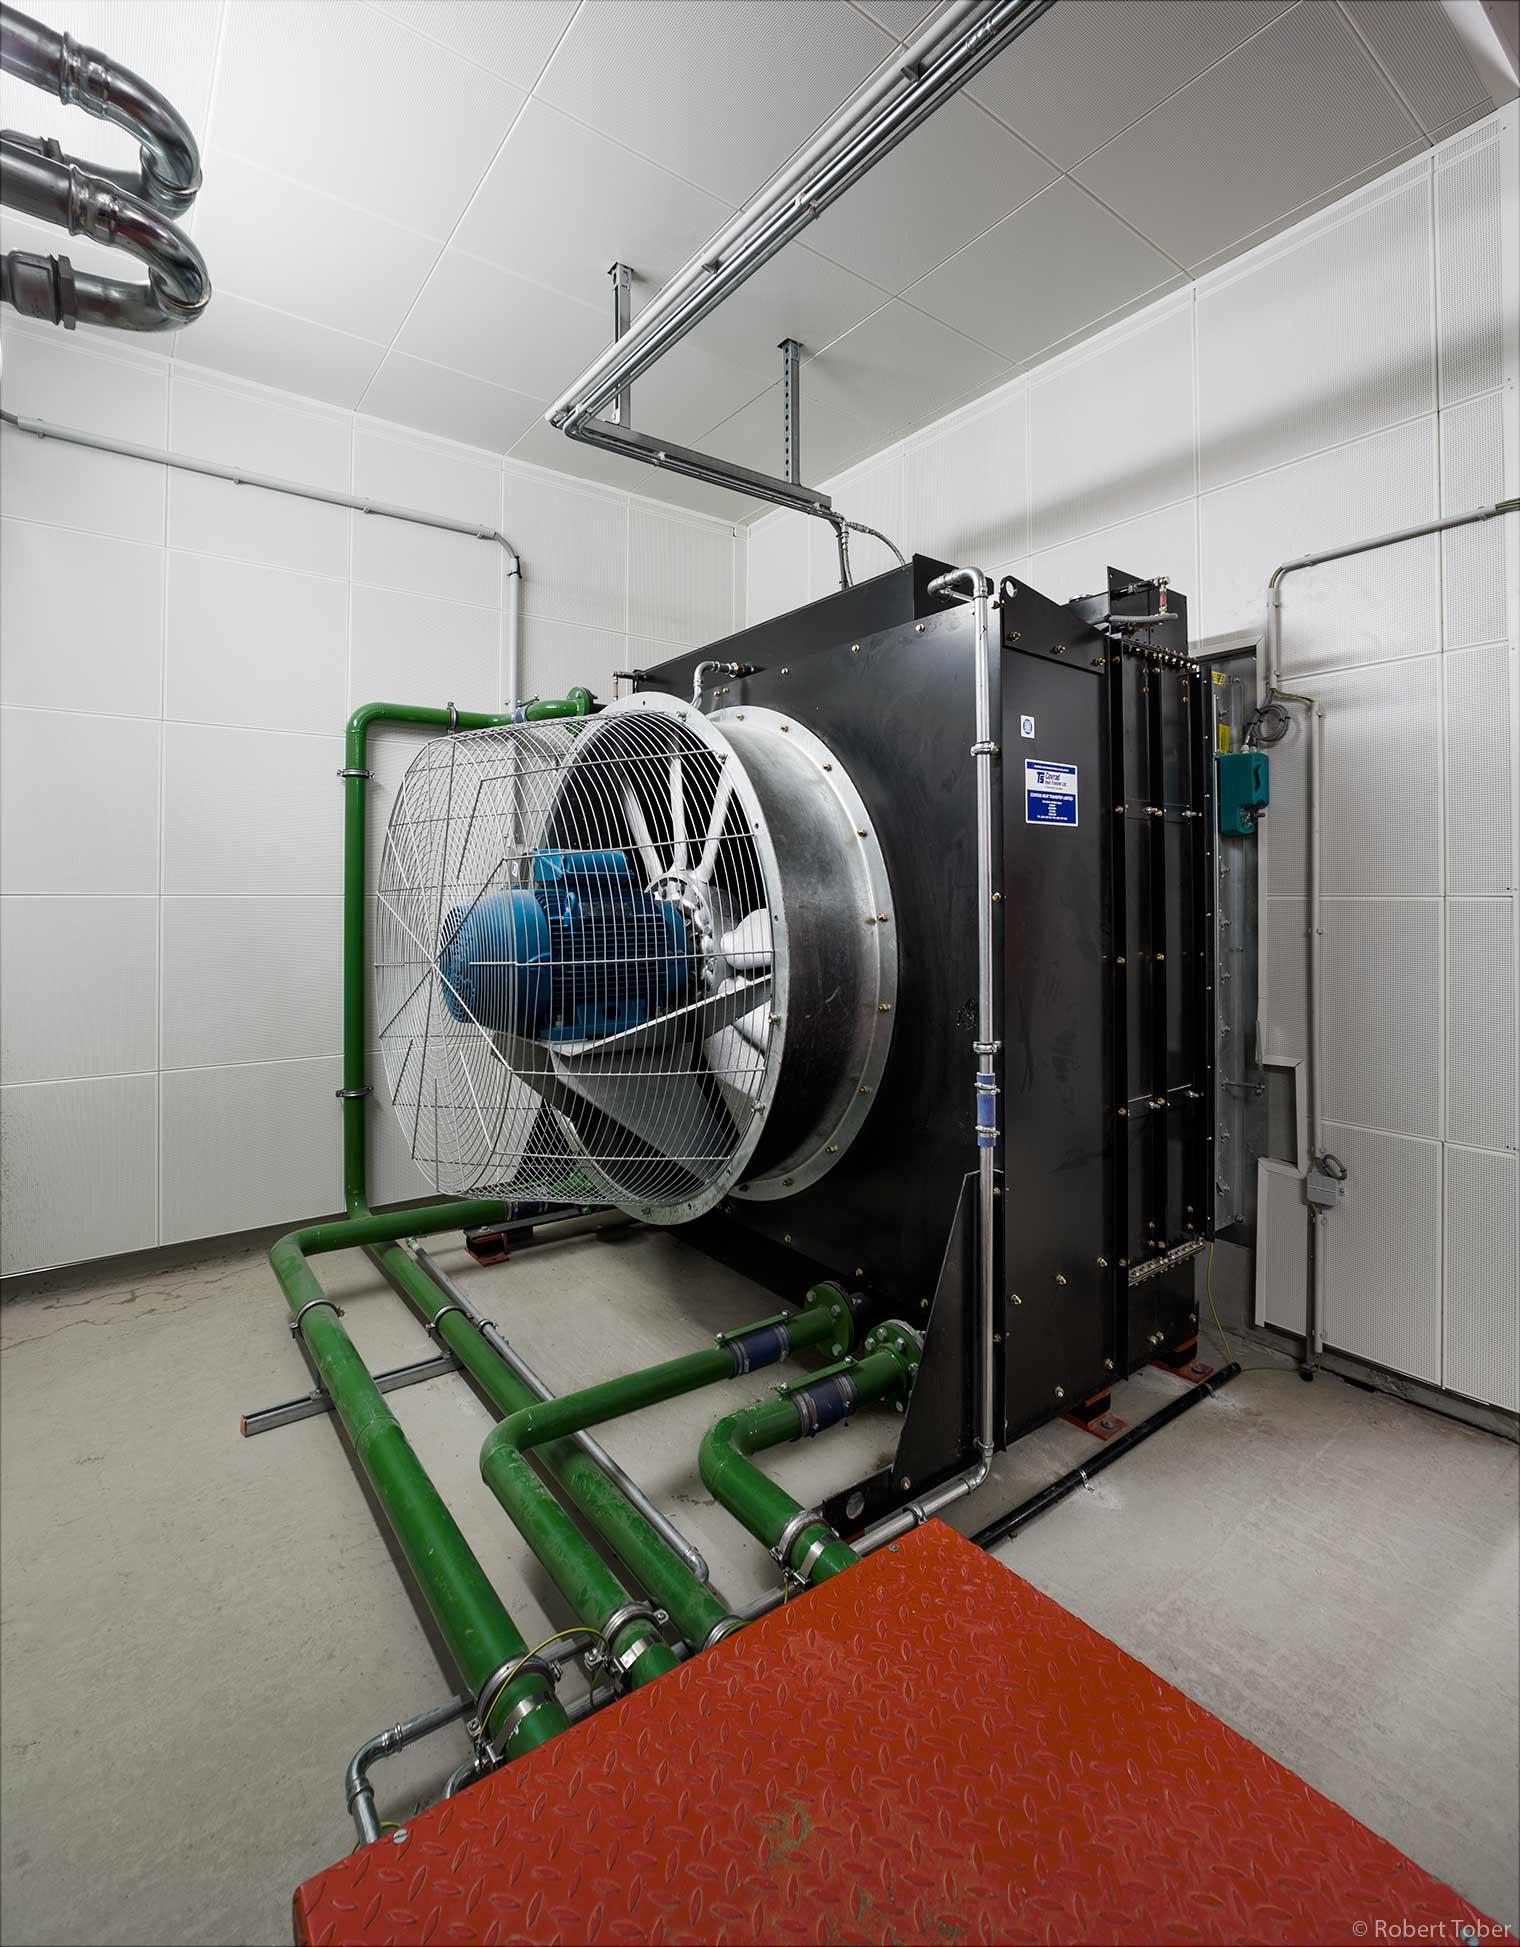 Landesklinikum Mistelbach · Wärmetauscher mit Elektro-Lüfter zum Kühlen des Cerveny 400 kVA USV Diesel Notstromgenerators · © Robert Tober Architekturfotograf